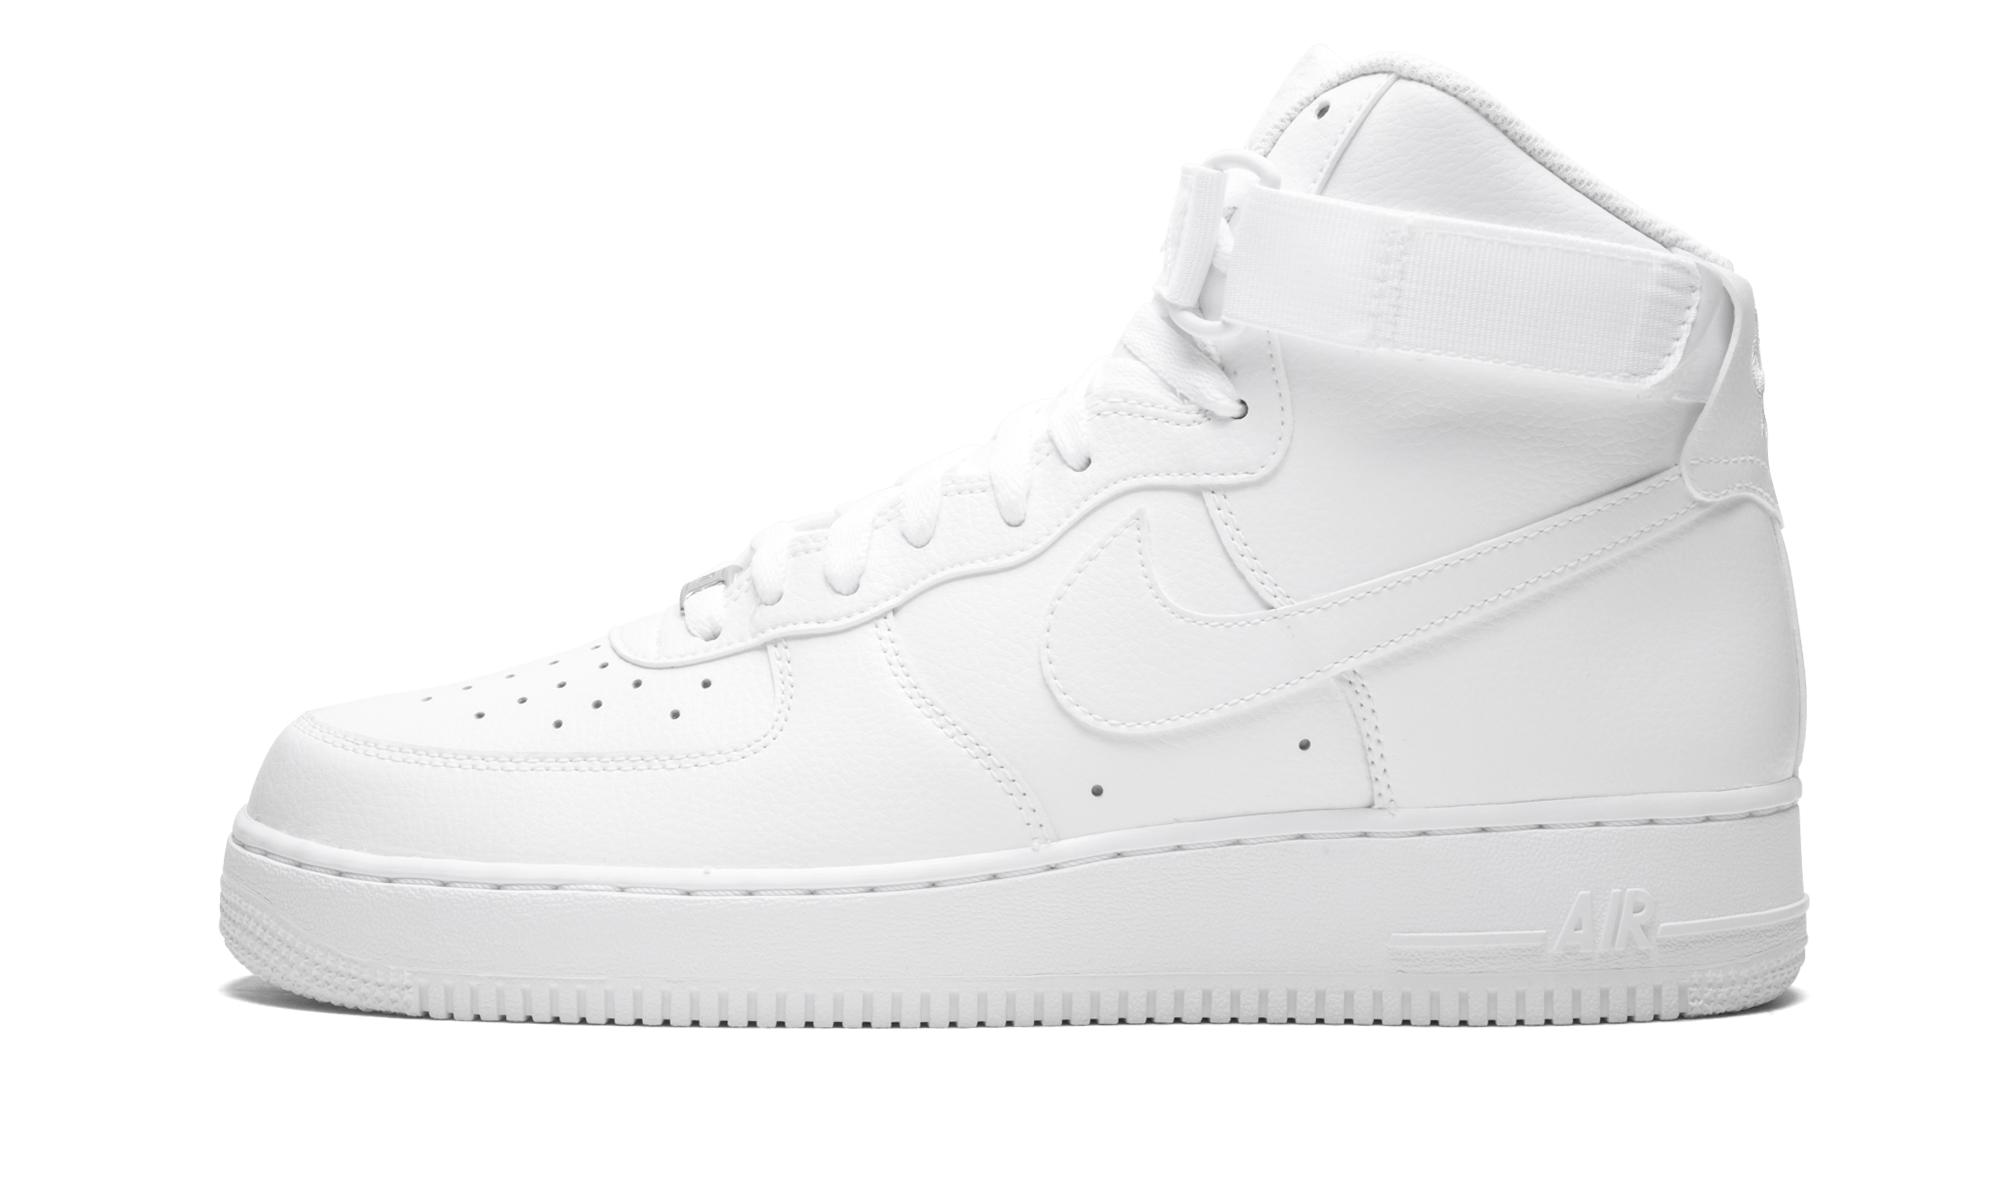 Nike. Men s White Air Force 1 High  07.  89 From Stadium Goods 92dd4c27f